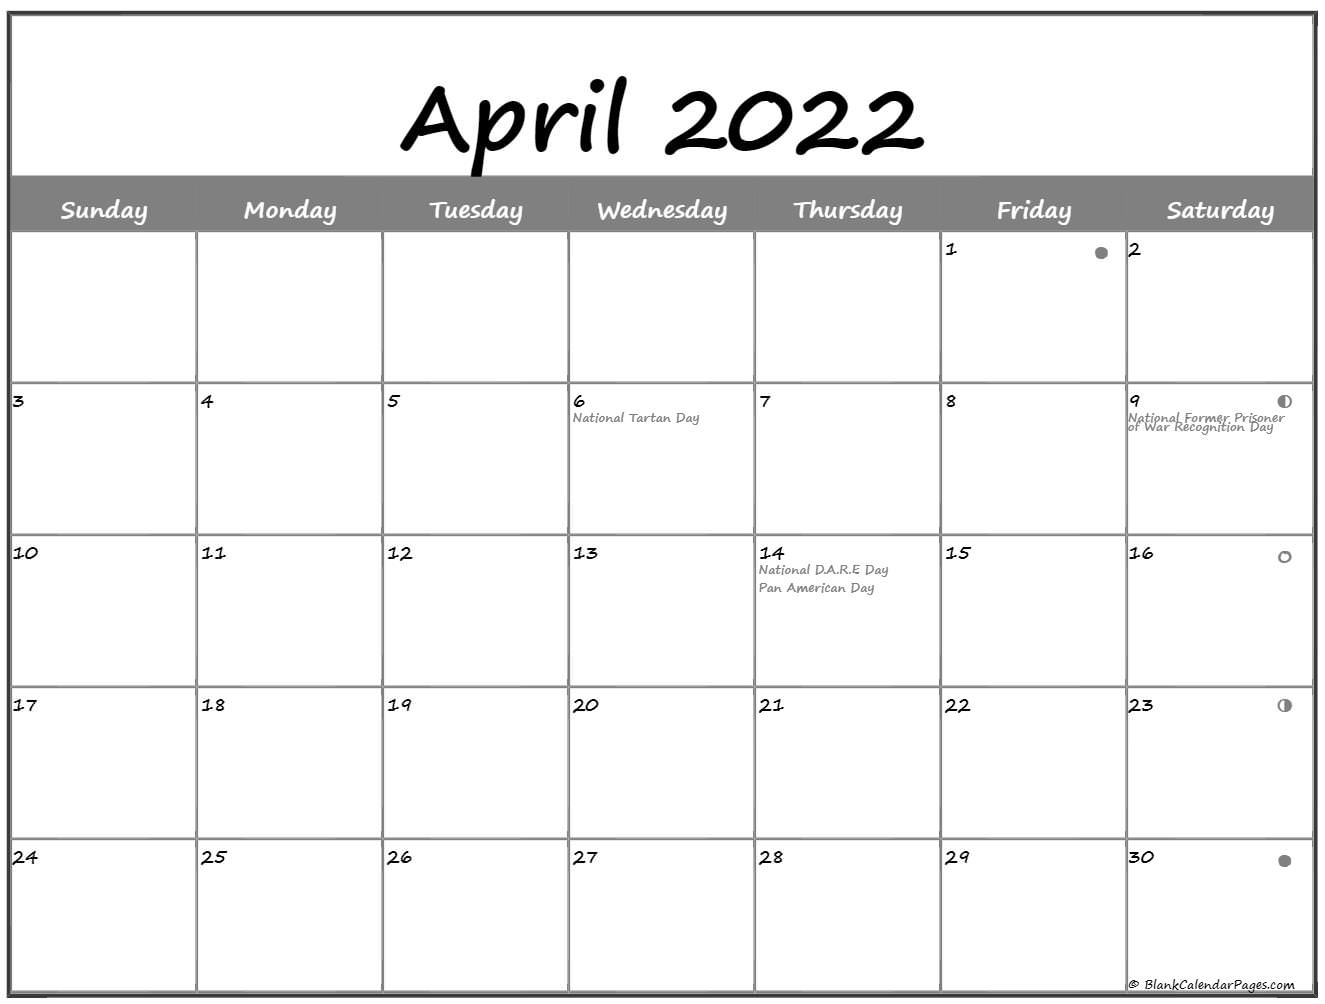 April Lunar Calendar